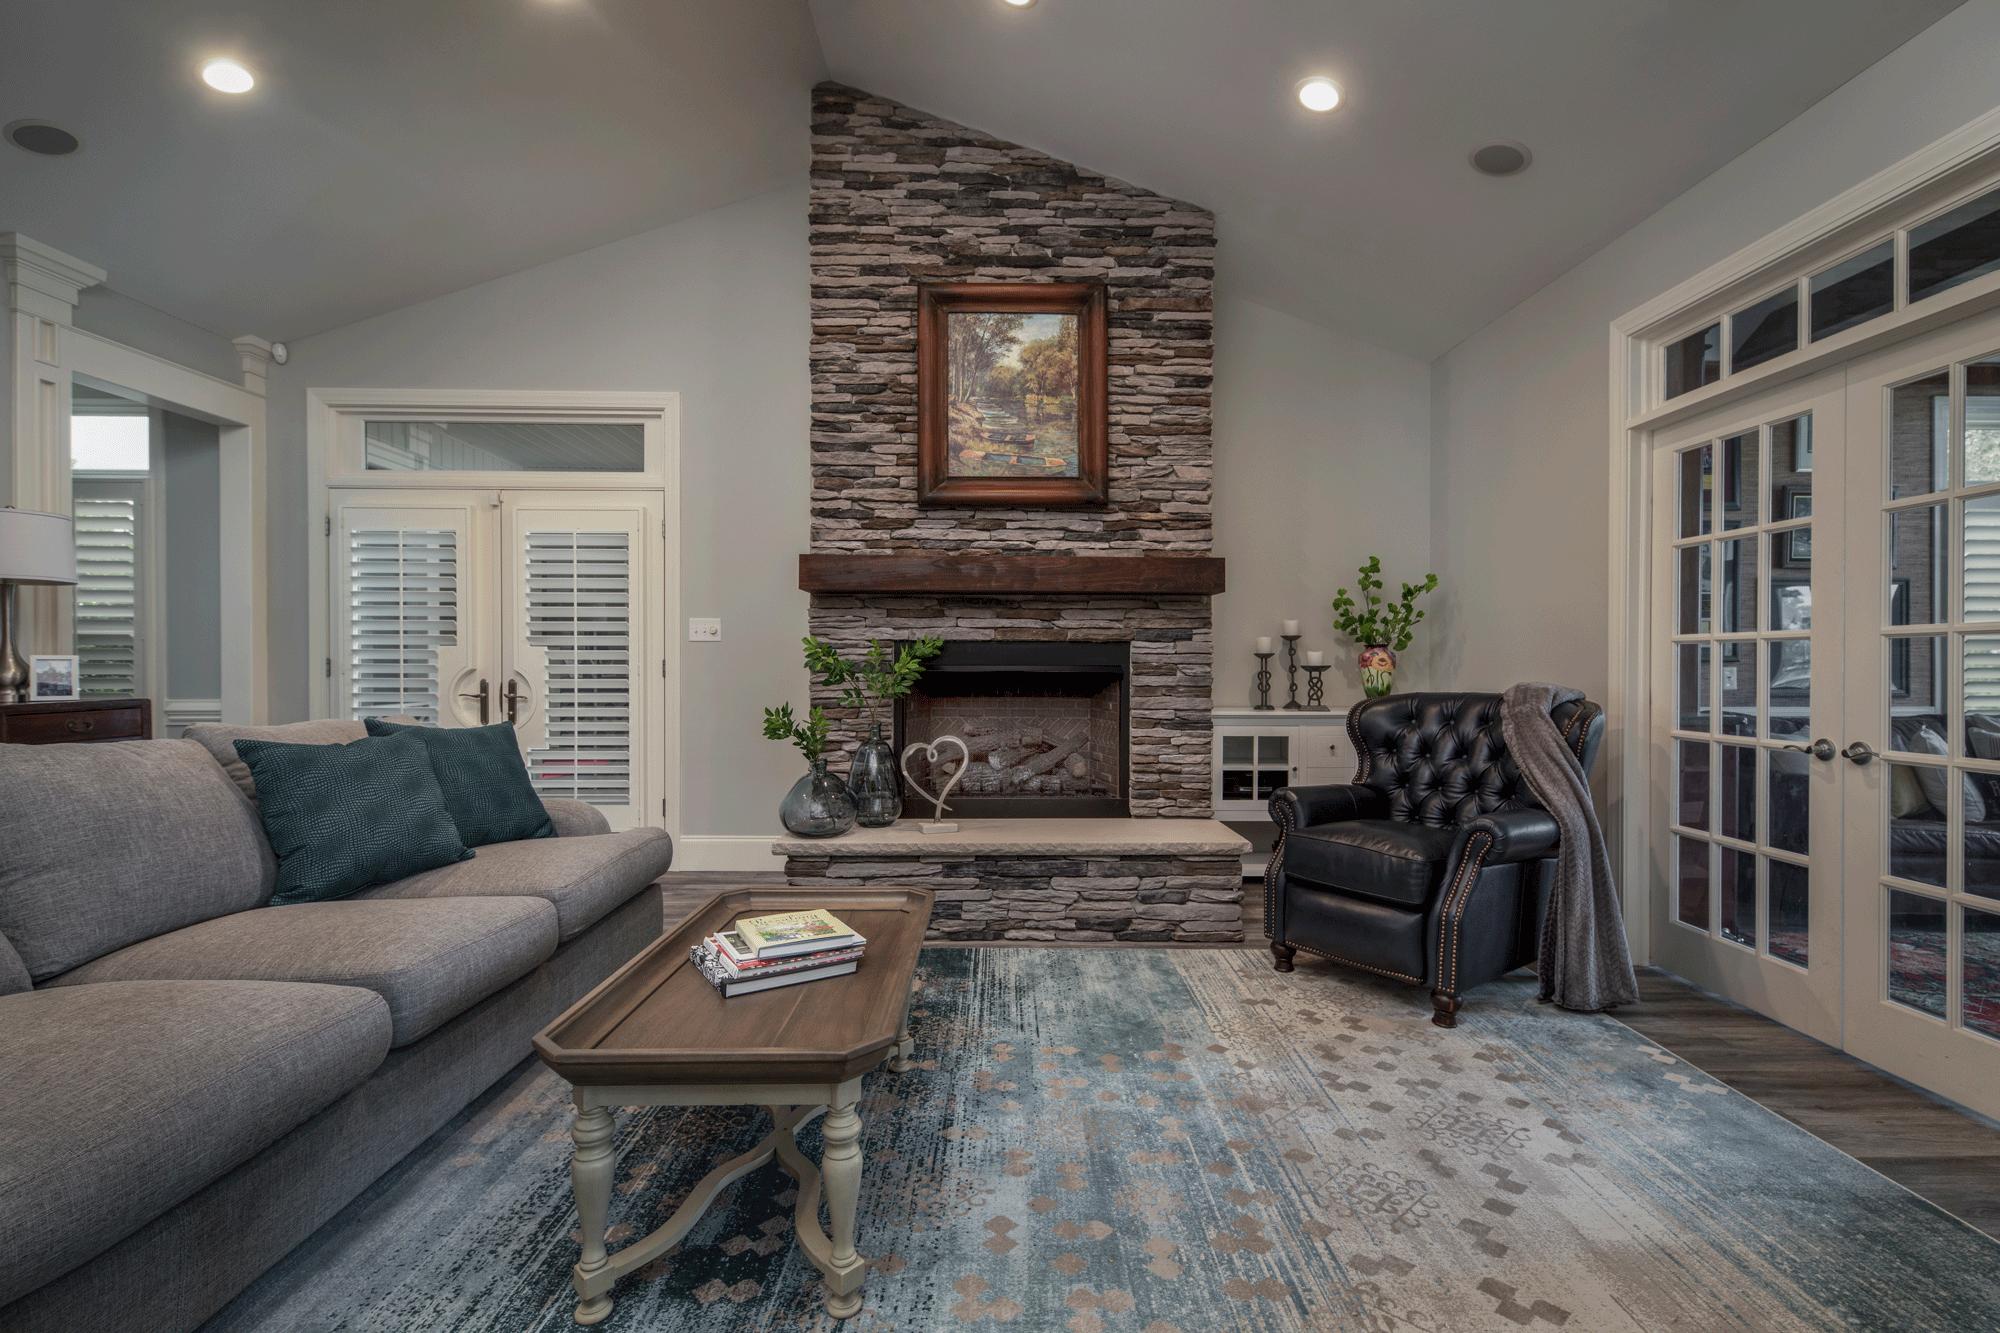 living room design with decor, seating, furniture, lighting, fireplace, flooring, artwork